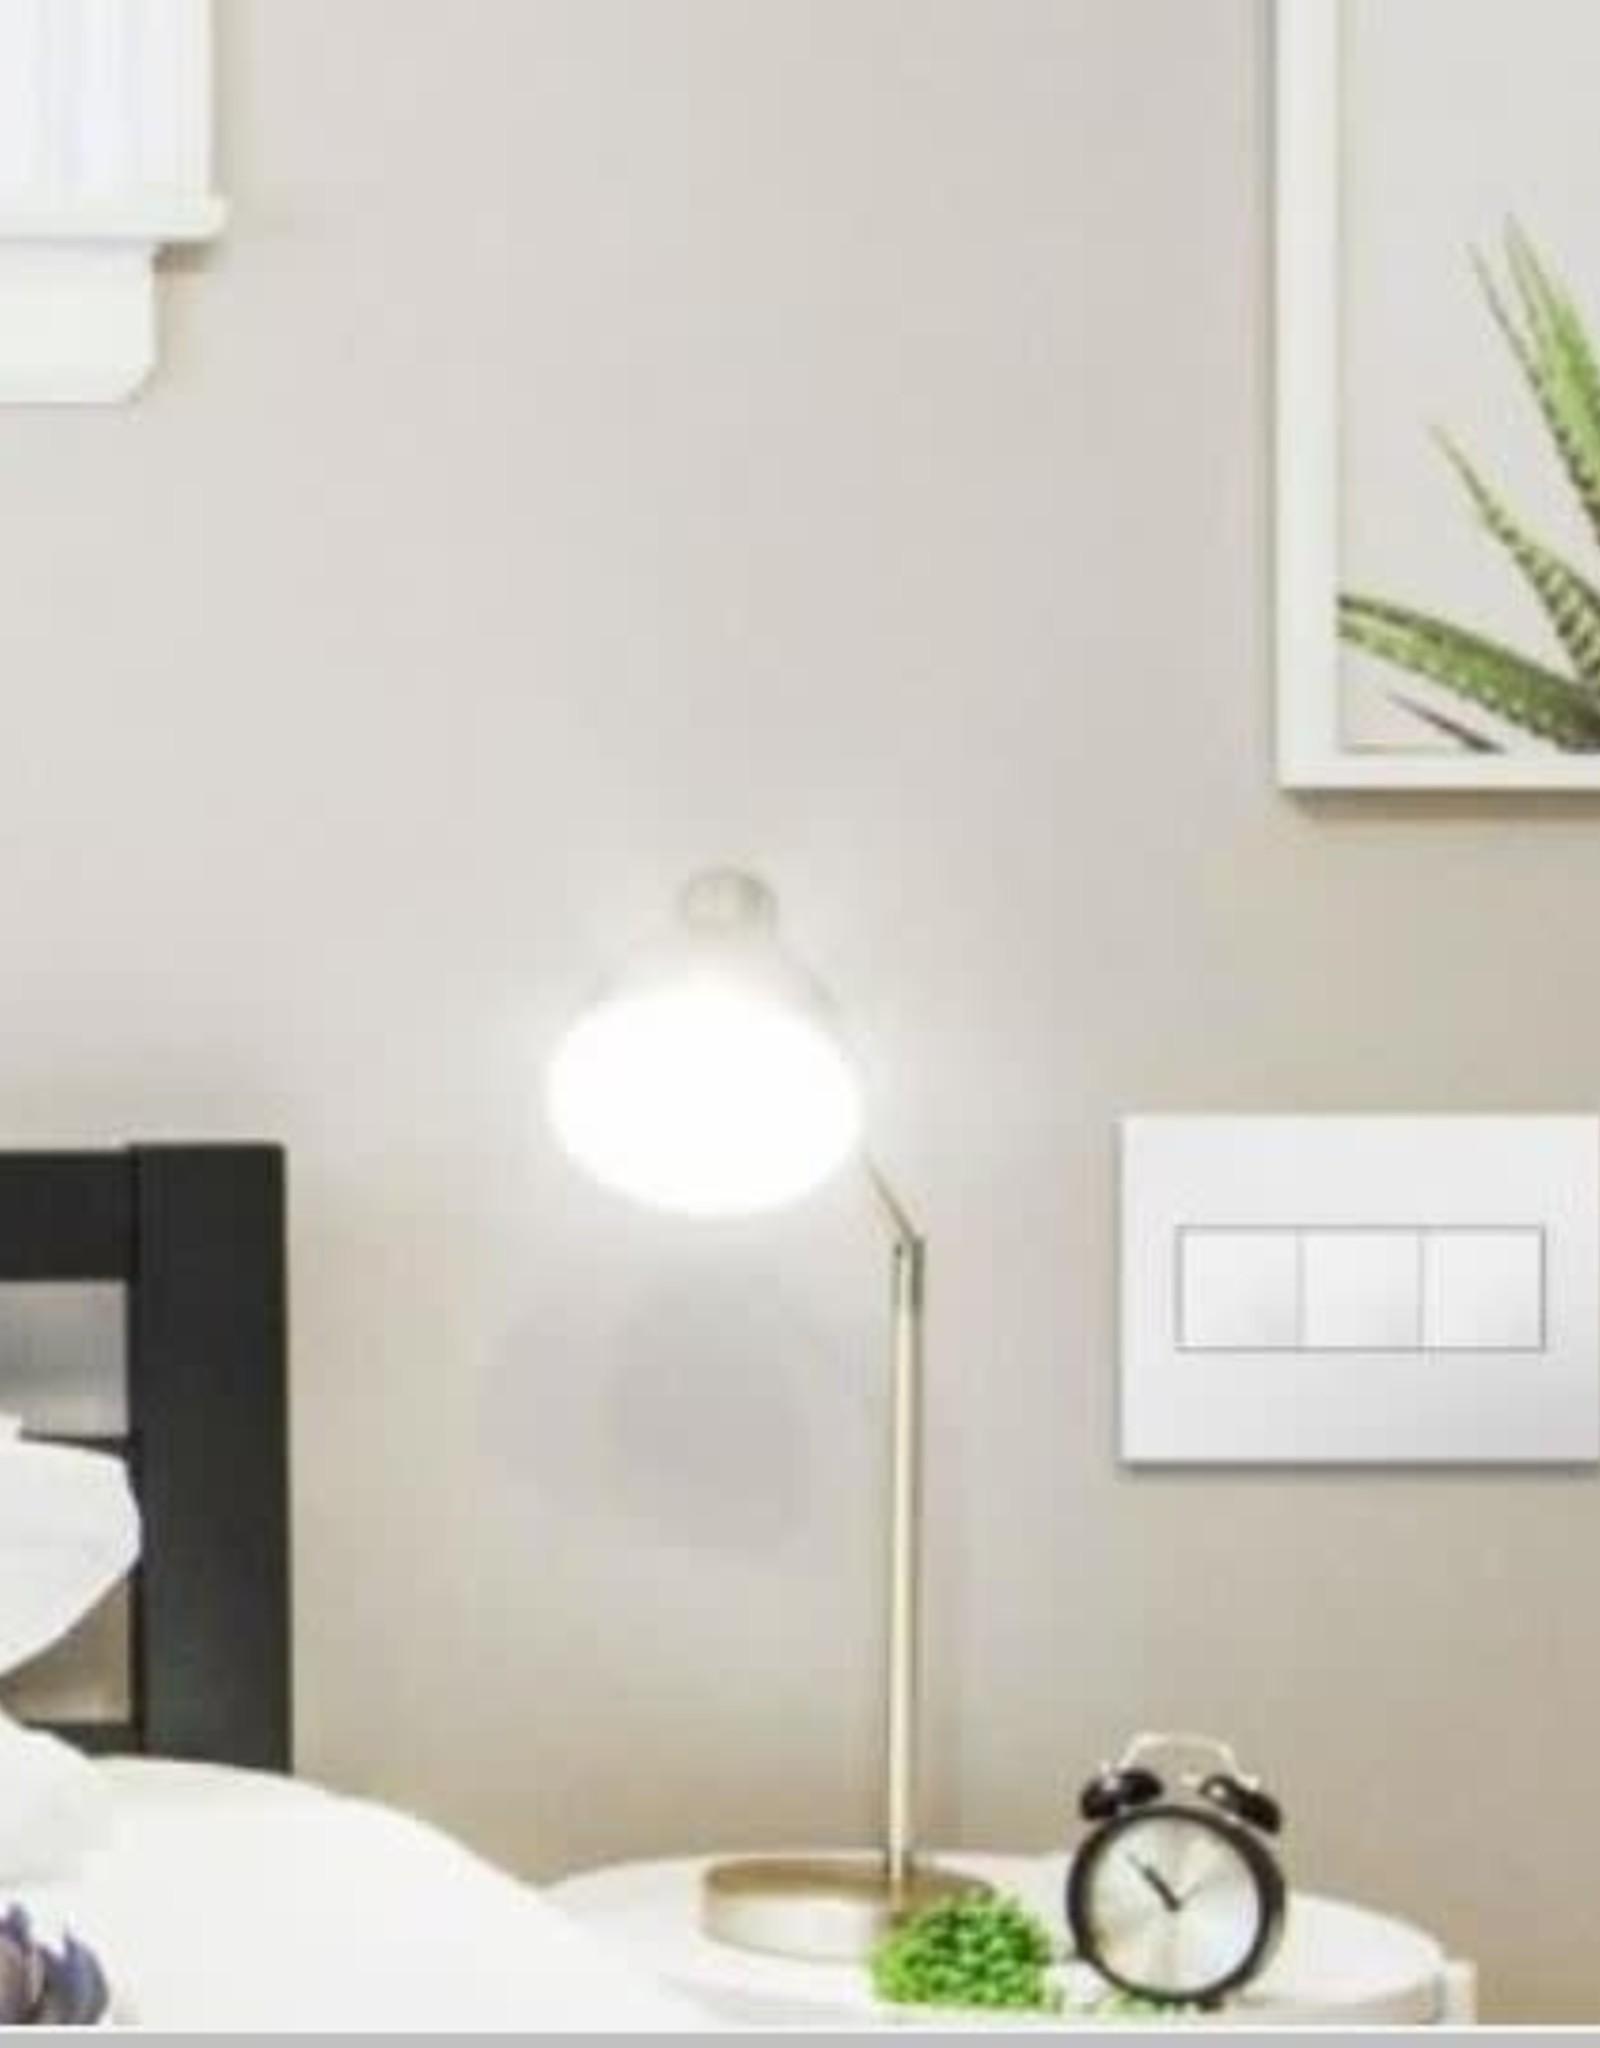 Legrand adorne Powder White 3-Gang Decorator/Rocker Wall Plate